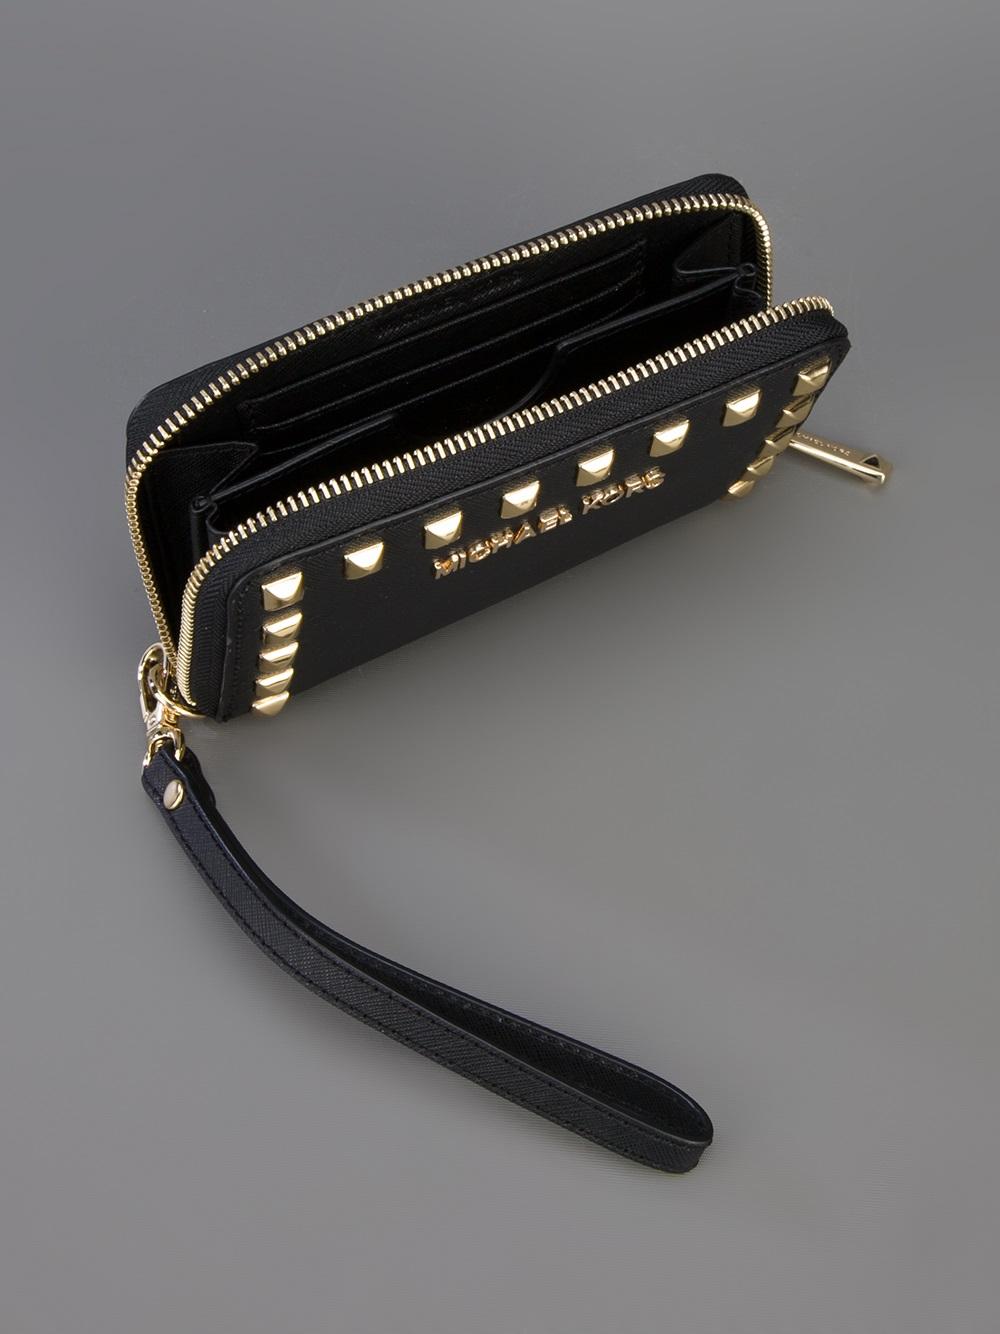 lyst michael kors studded wristlet wallet in black